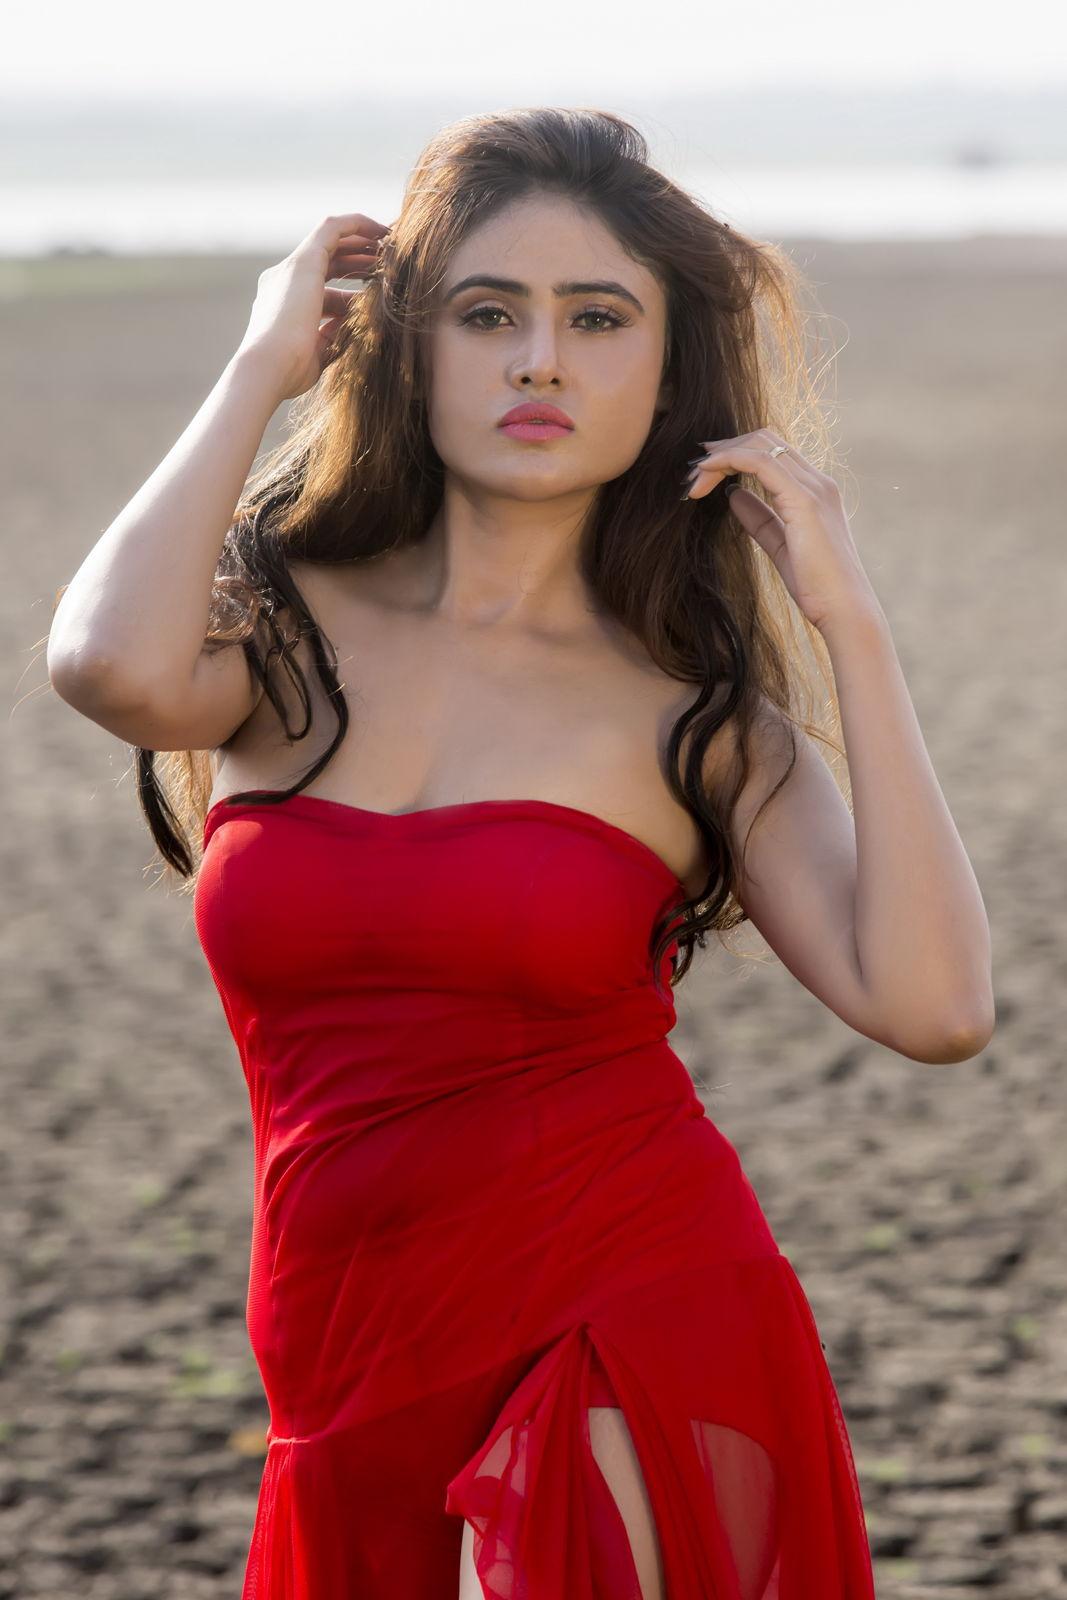 Punjabi Girl Wallpaper Photos Hd Sony Charista Hot Photo Shoot Gallery Hd Latest Tamil